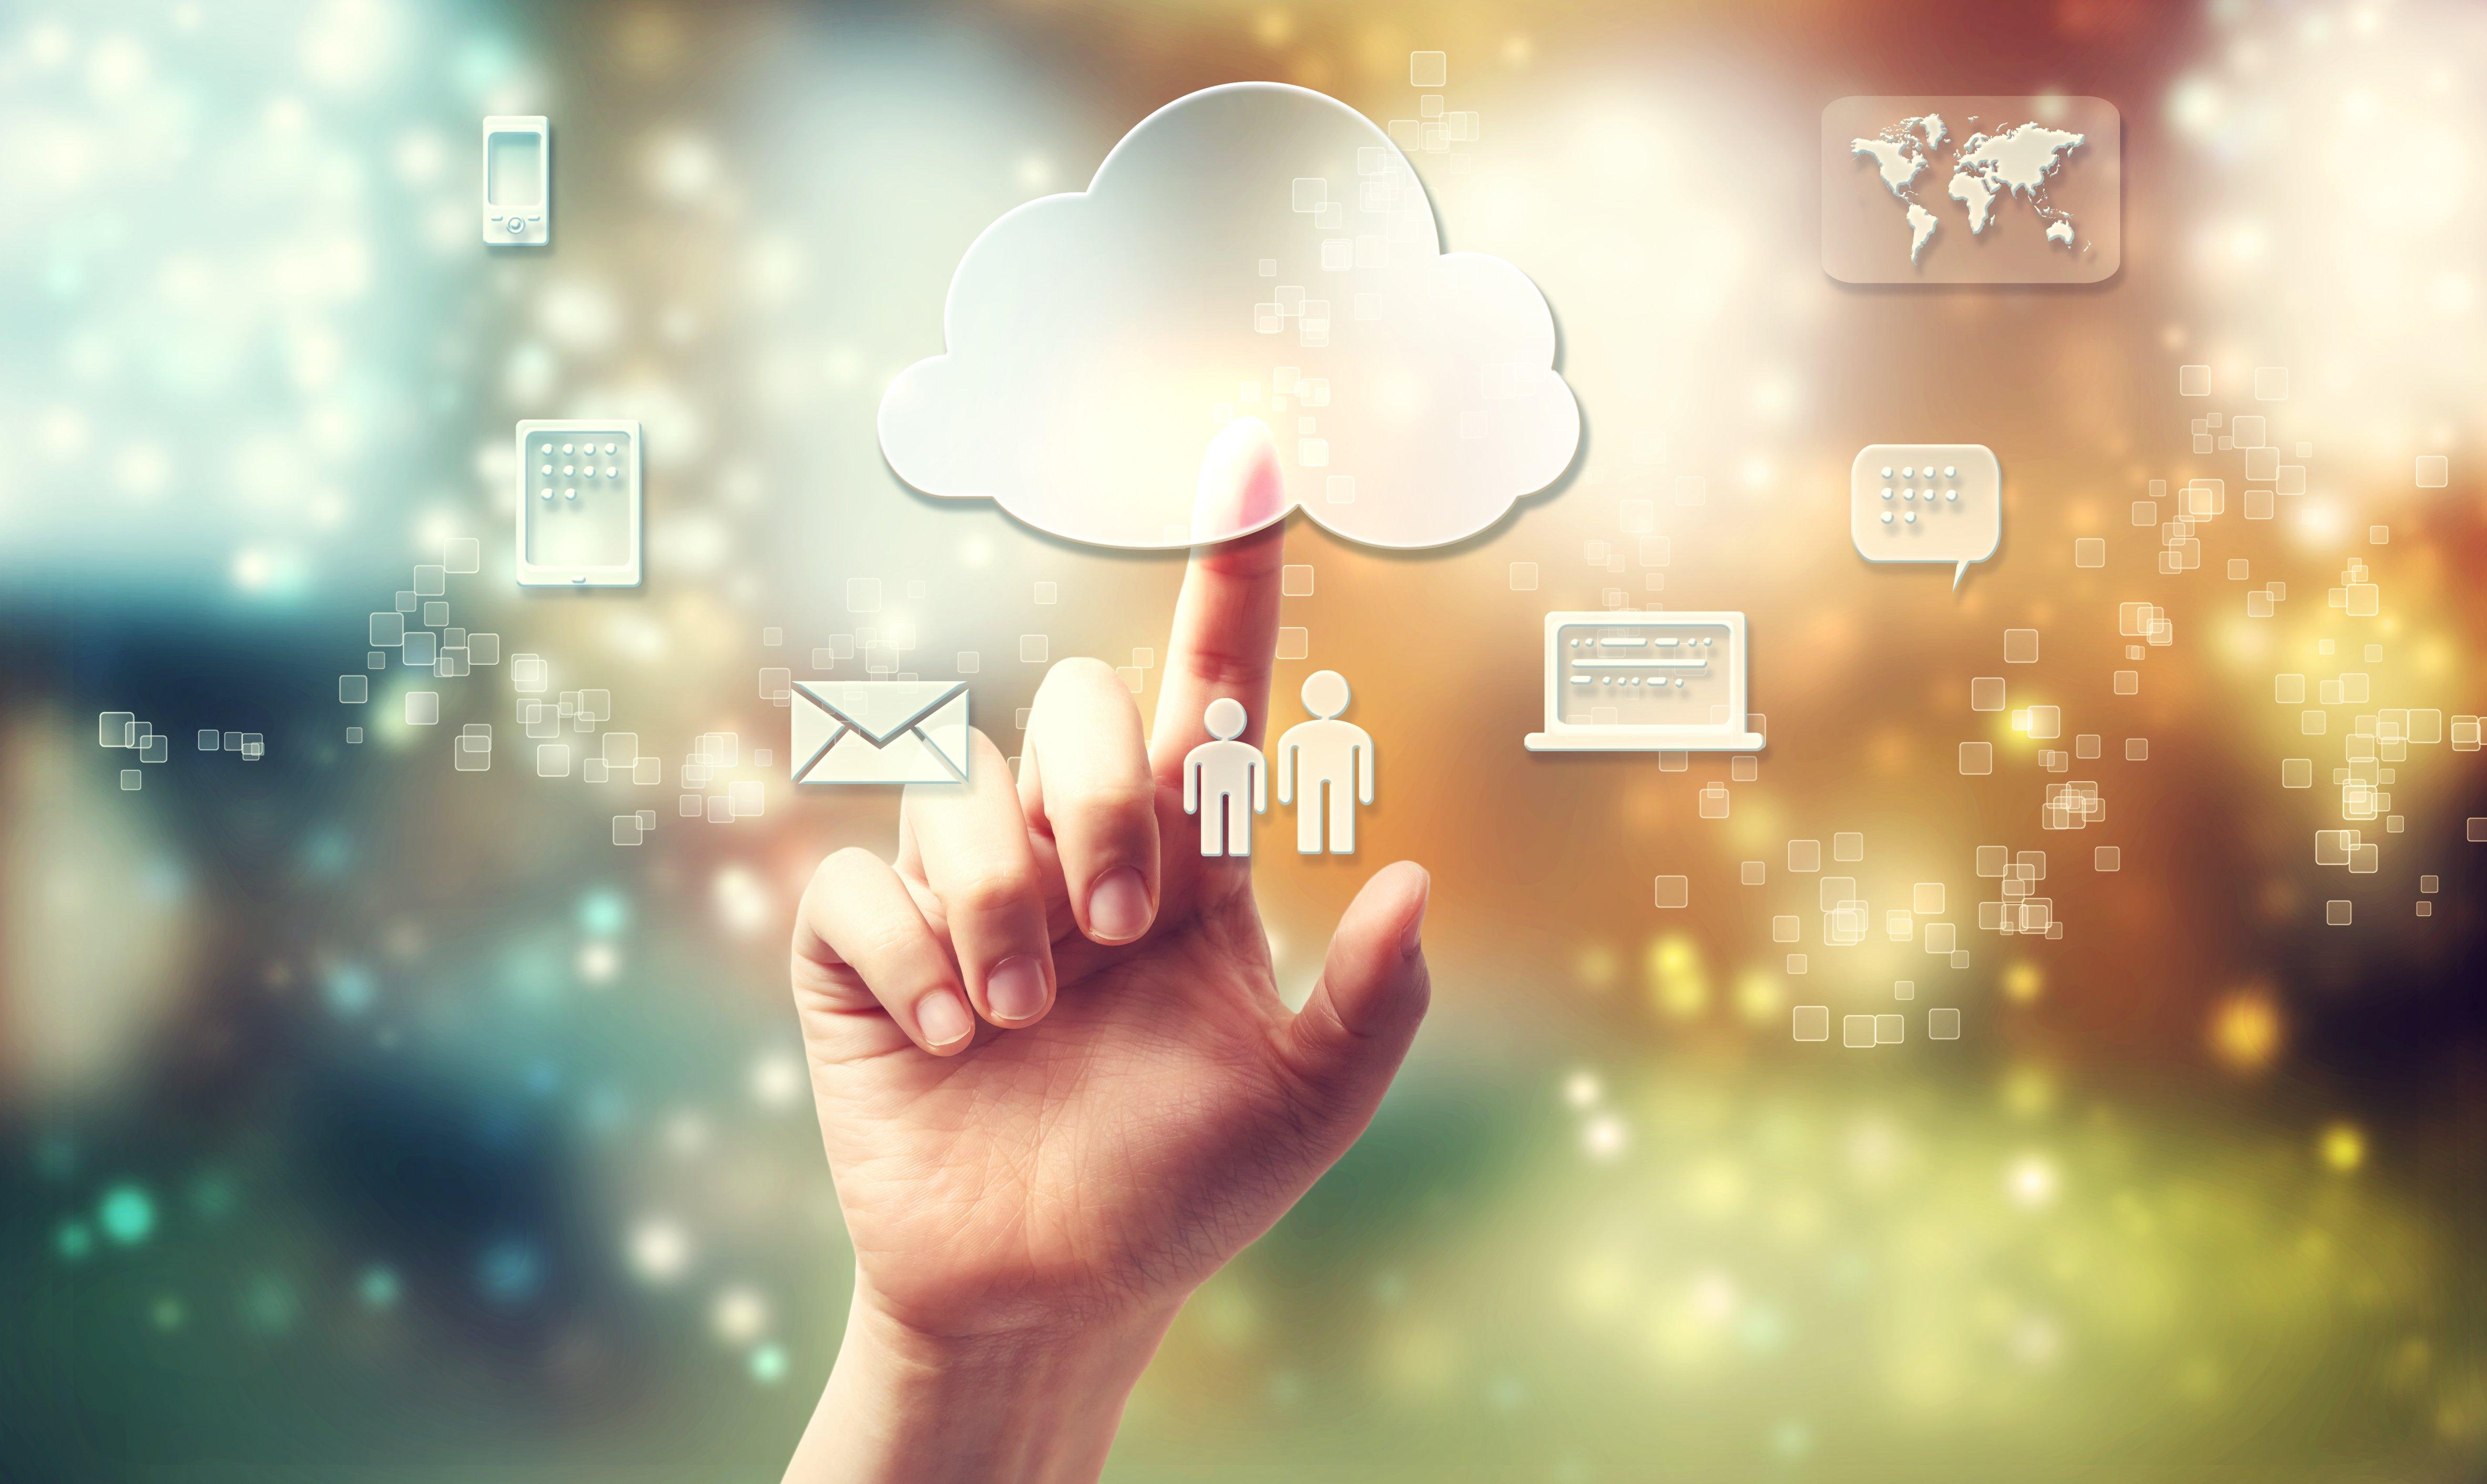 public-cloud-services-market-to-grow-18-to-246.8-billion-in-2017-gartner-says-1.jpg